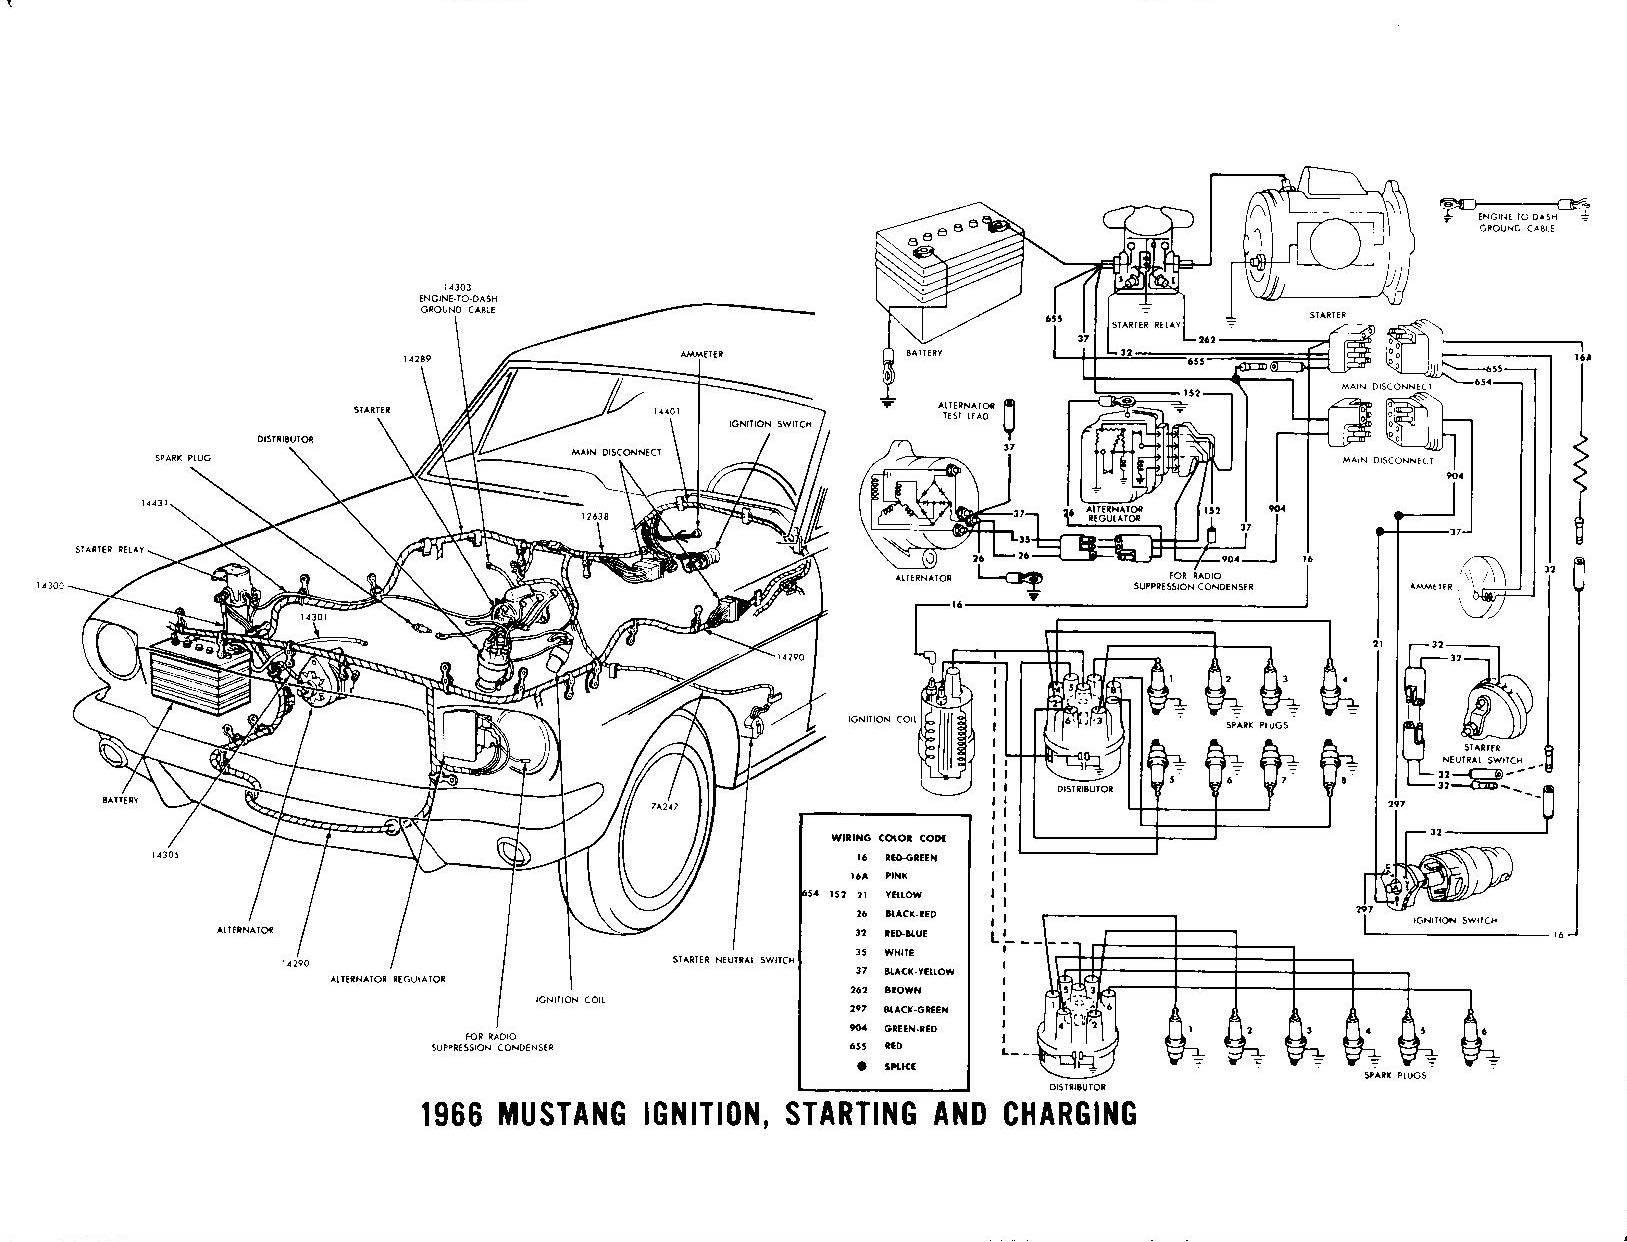 hight resolution of 1965 mustang voltage regulator wiring diagram schematic wiring diagram 1965 mustang voltage regulator wiring diagram wiring